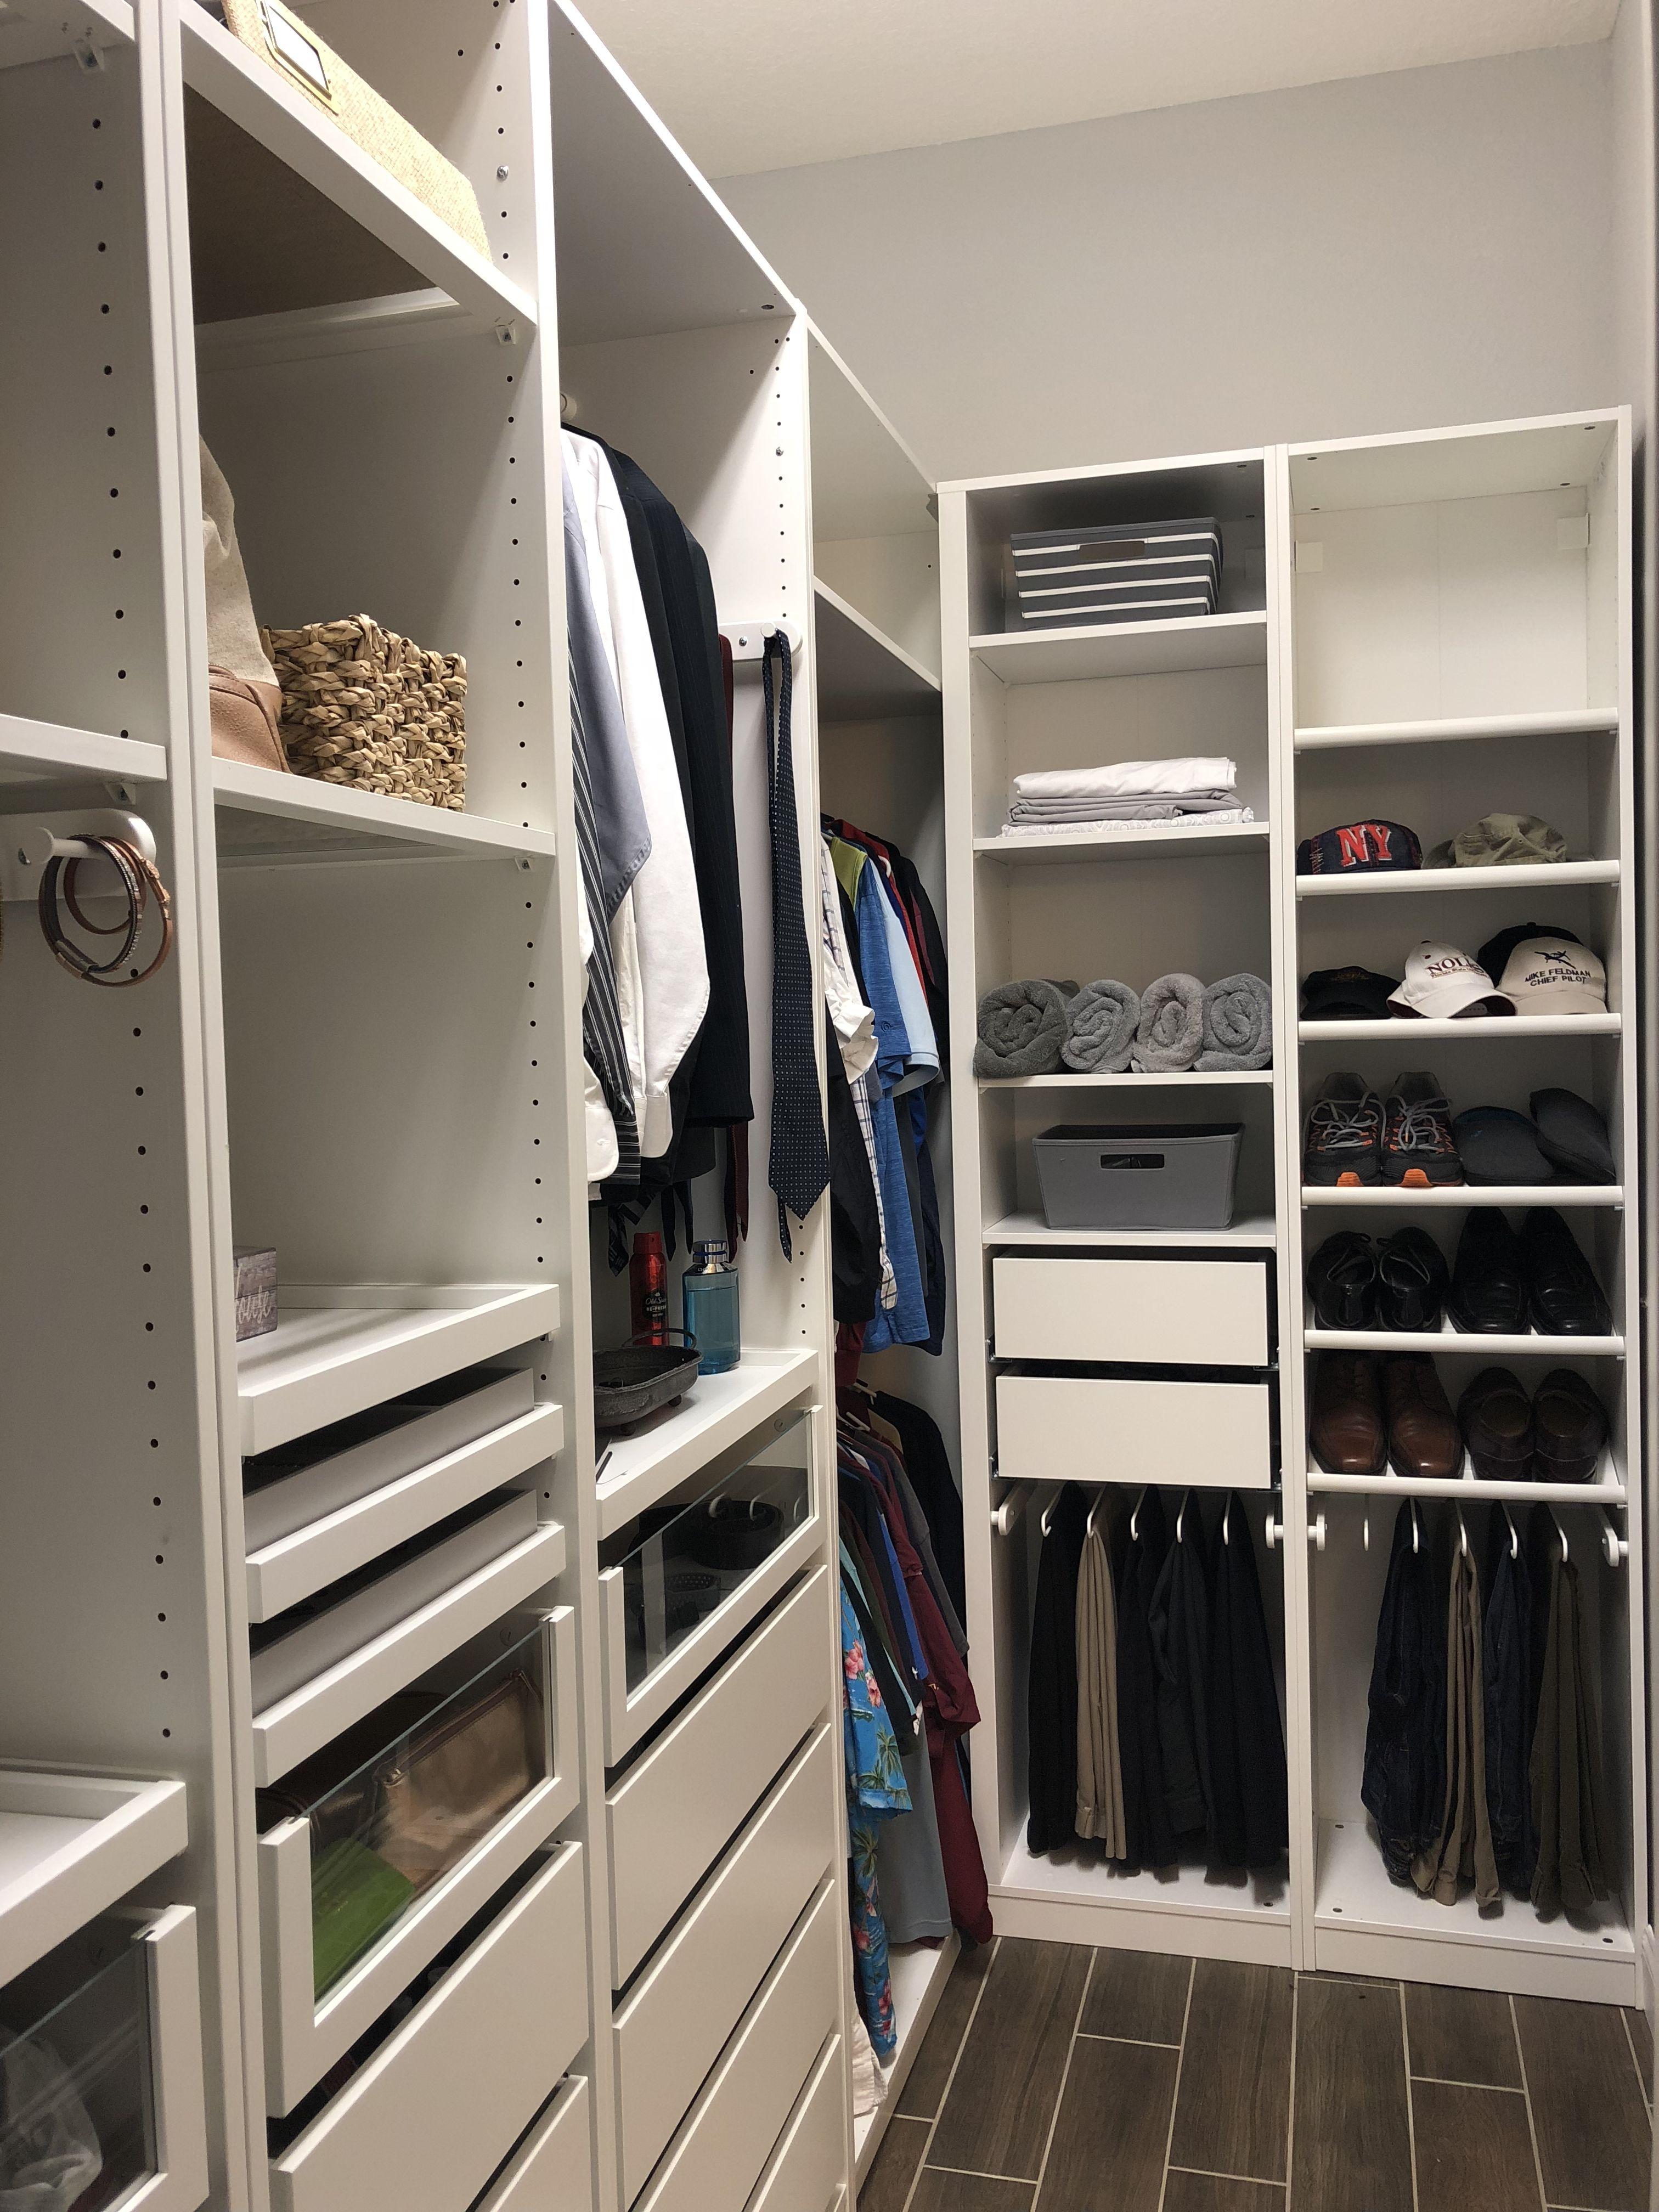 Ikea Pax Wardrobe His Side Closet Layout Walk In Closet Ikea Closet Planning